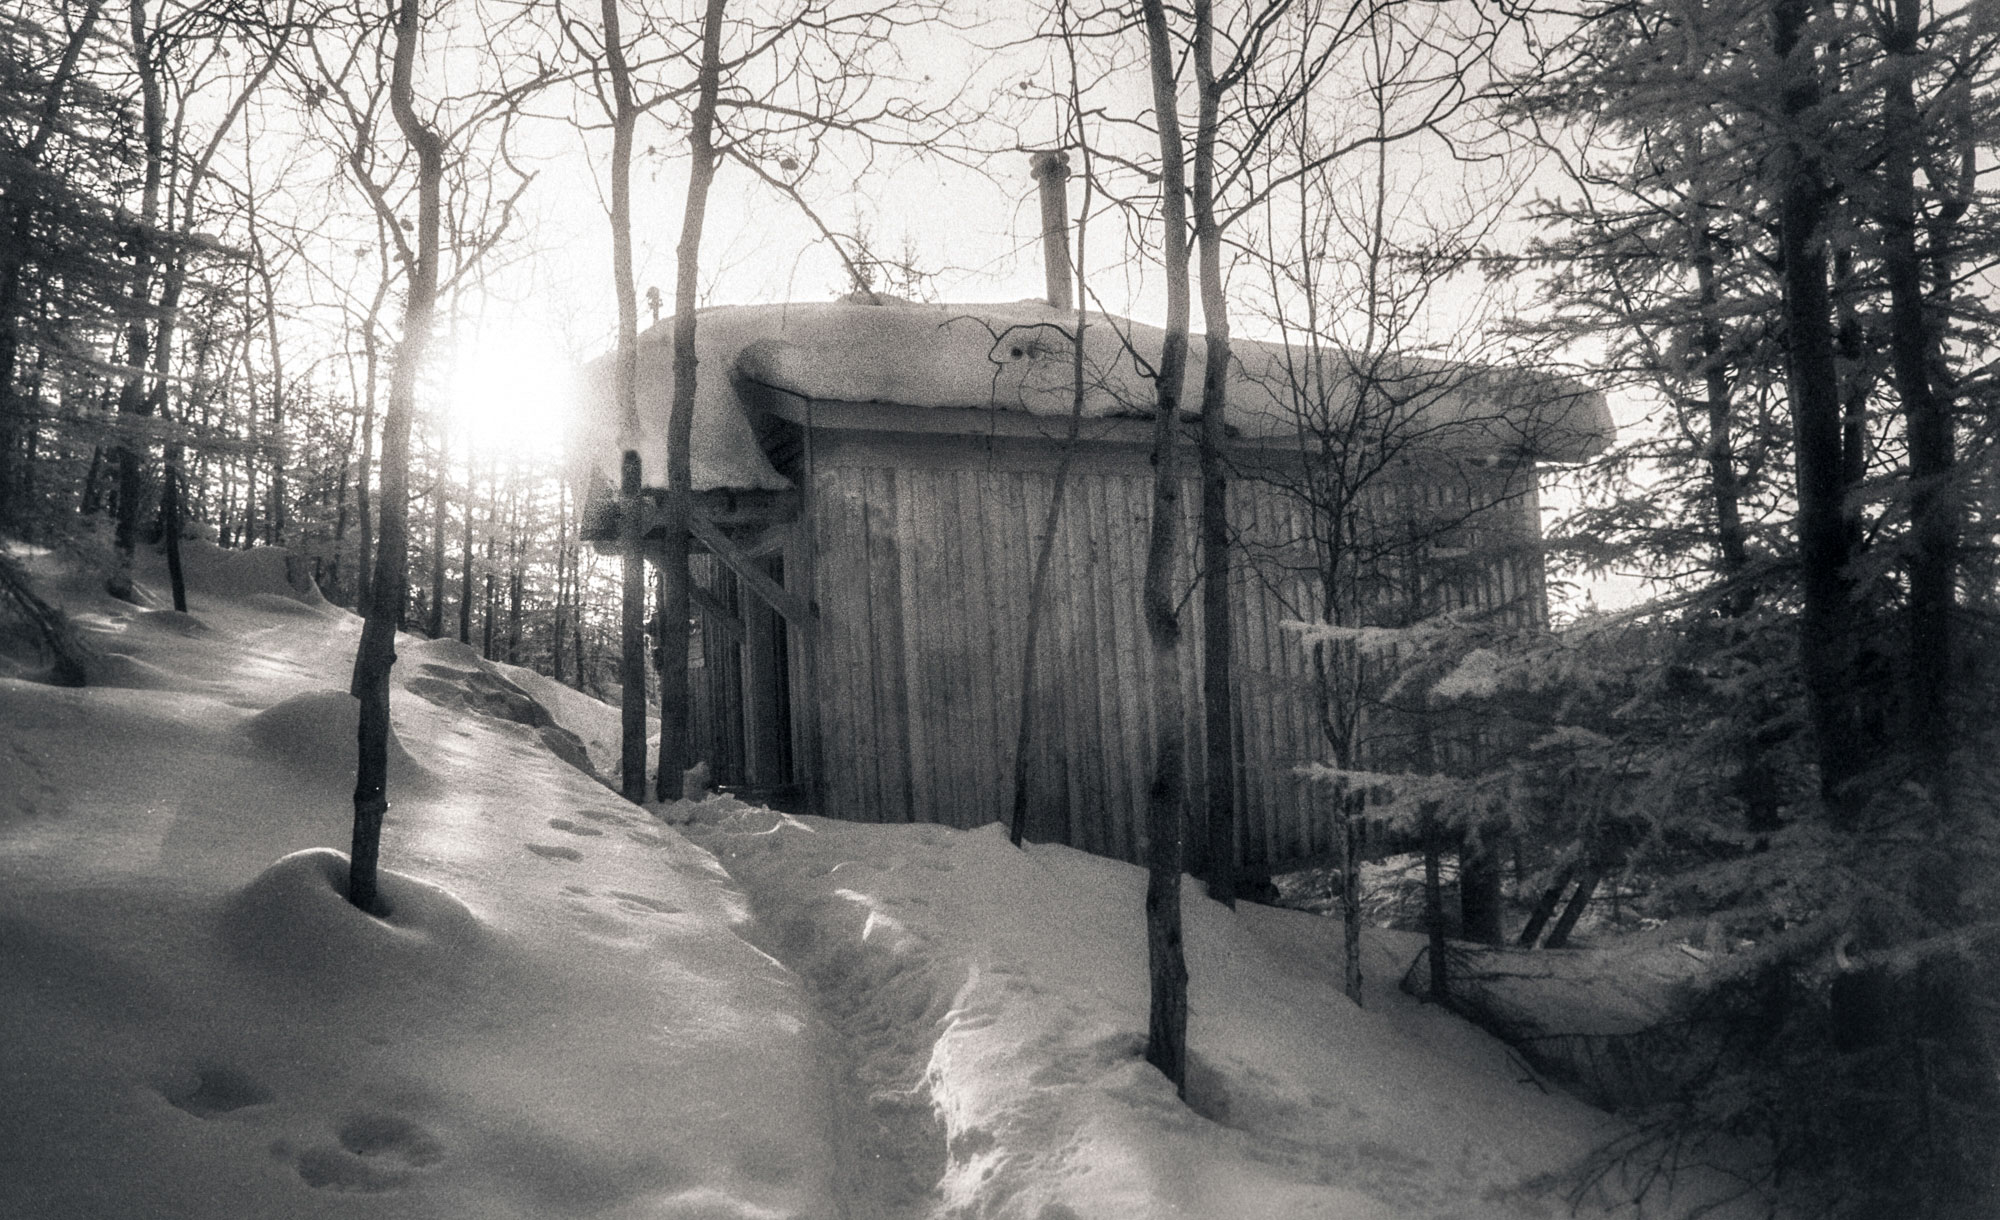 Adams' studio in Fairbanks, Alaska, 1996. Dennis Keeley